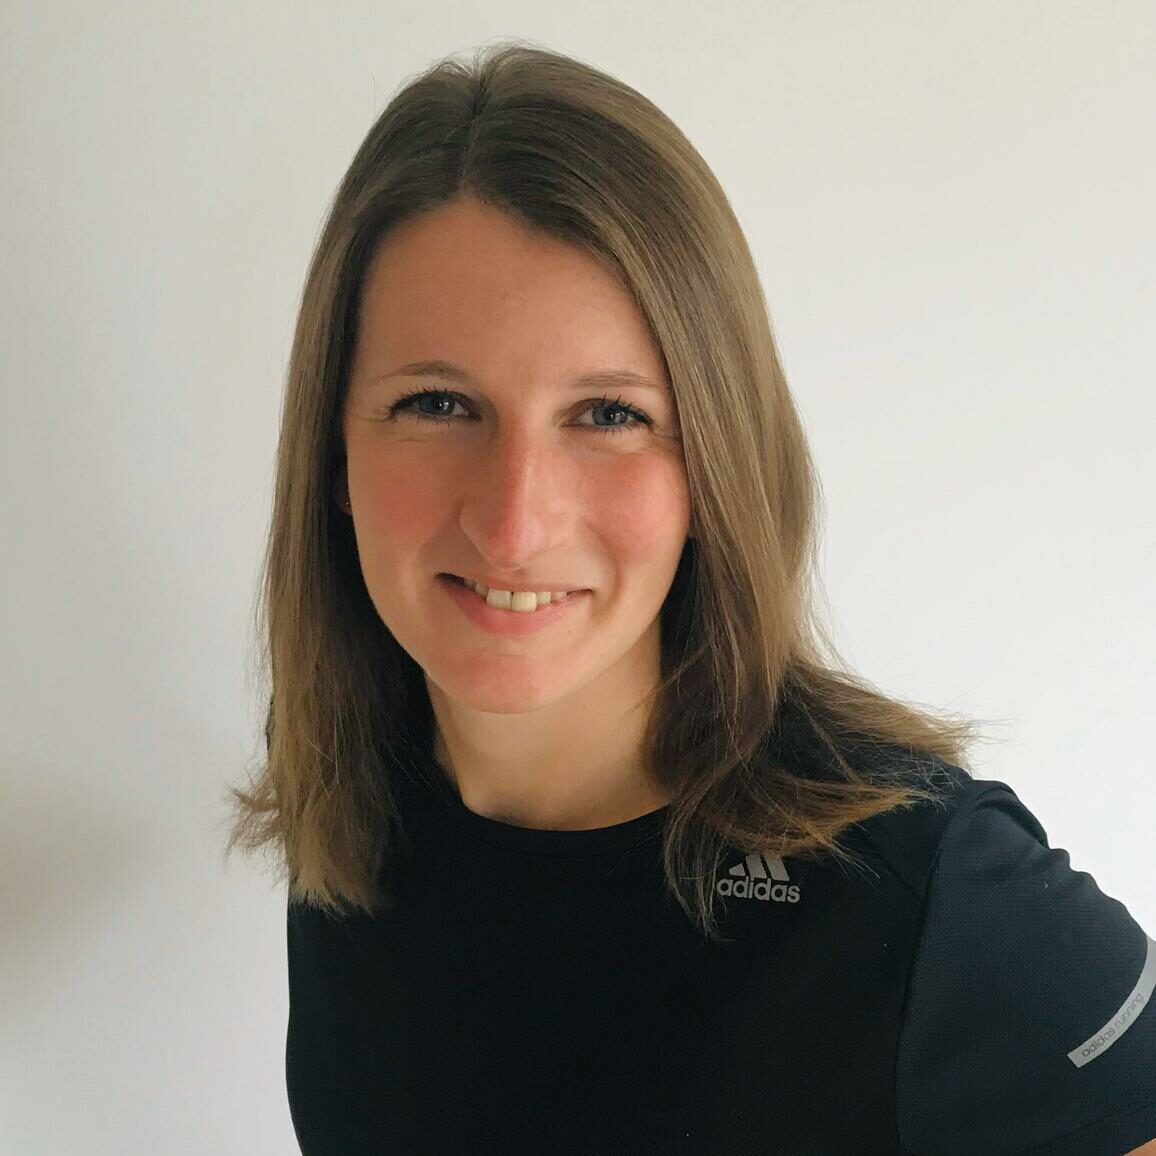 Caroline Schatz